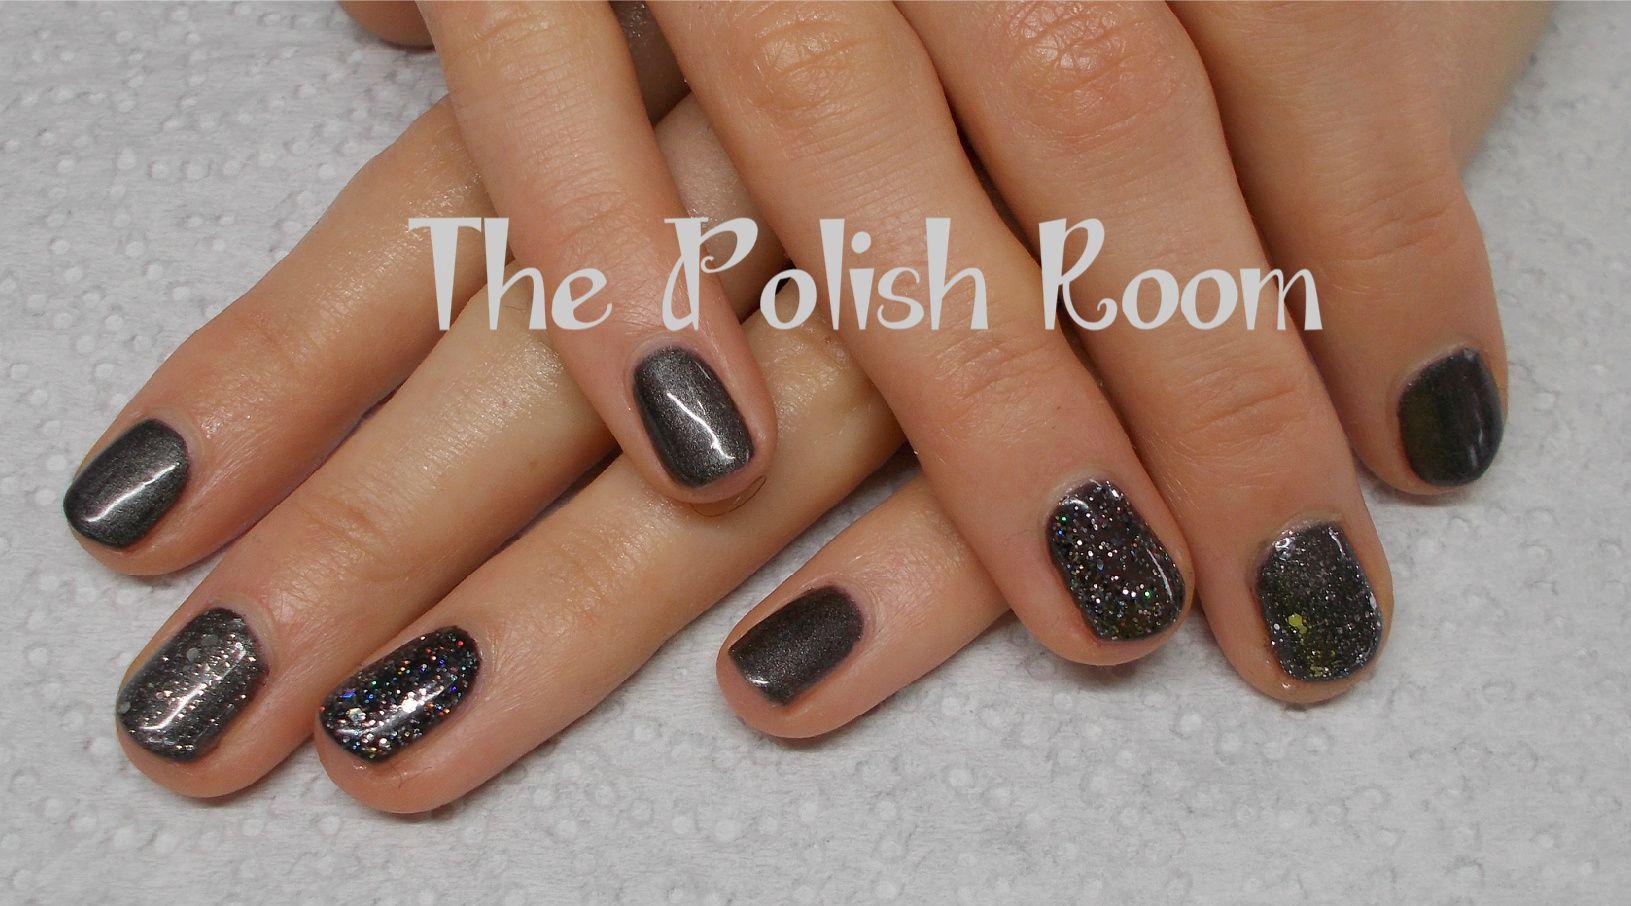 Natural nails, gel polish manicure, gunmetal grey, glitter, black, sparkles, nailart